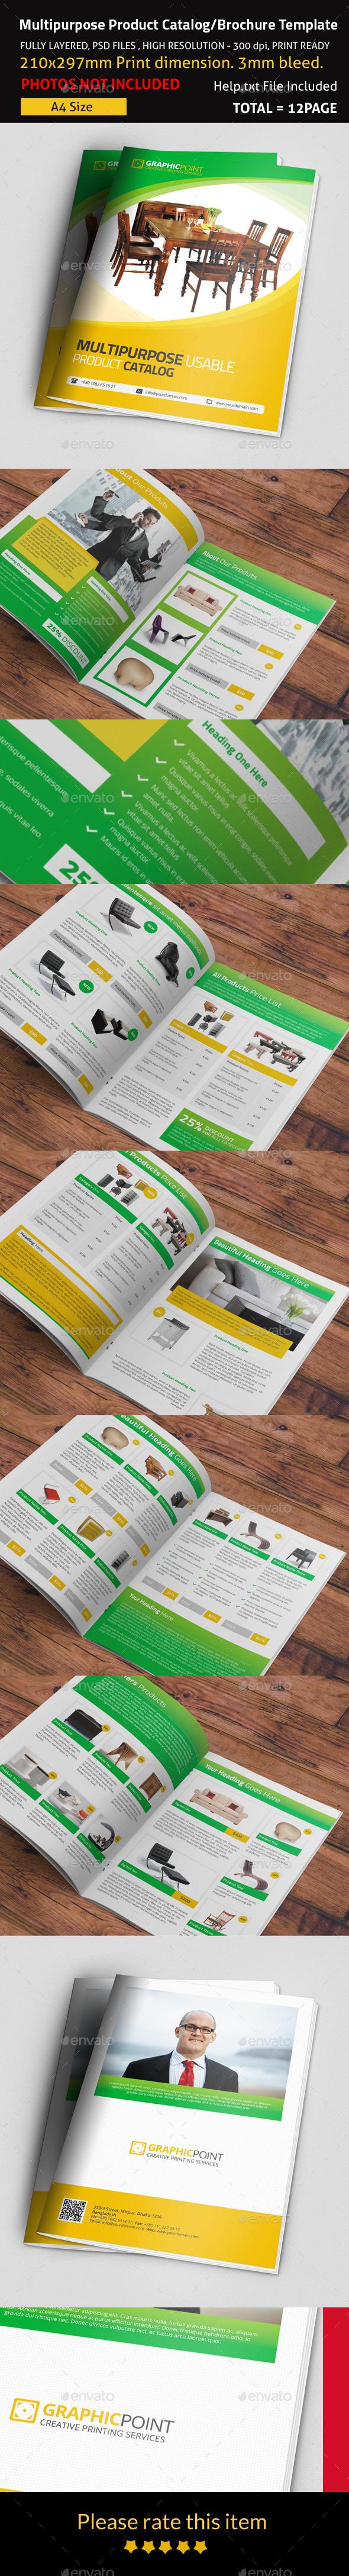 GraphicRiver Multipurpose Product Catalog Brochure Template 9301558